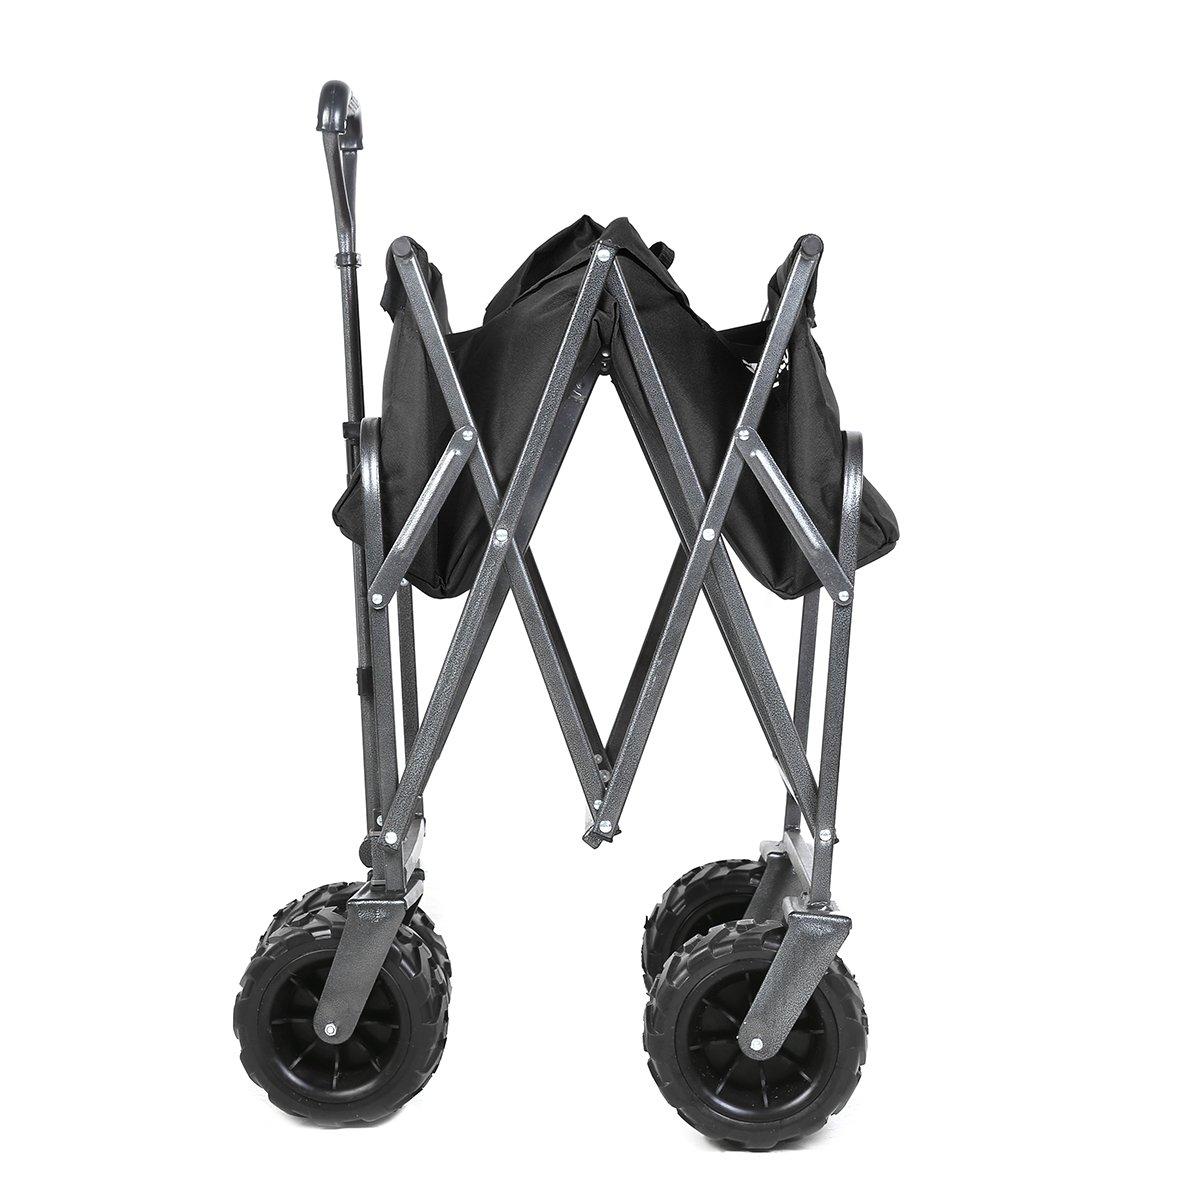 265 Pound Capacity Sekey Folding Wagon Cart Collapsible Outdoor Utility Wagon Heavy Duty Beach Wagon with All-Terrain Wheels Black